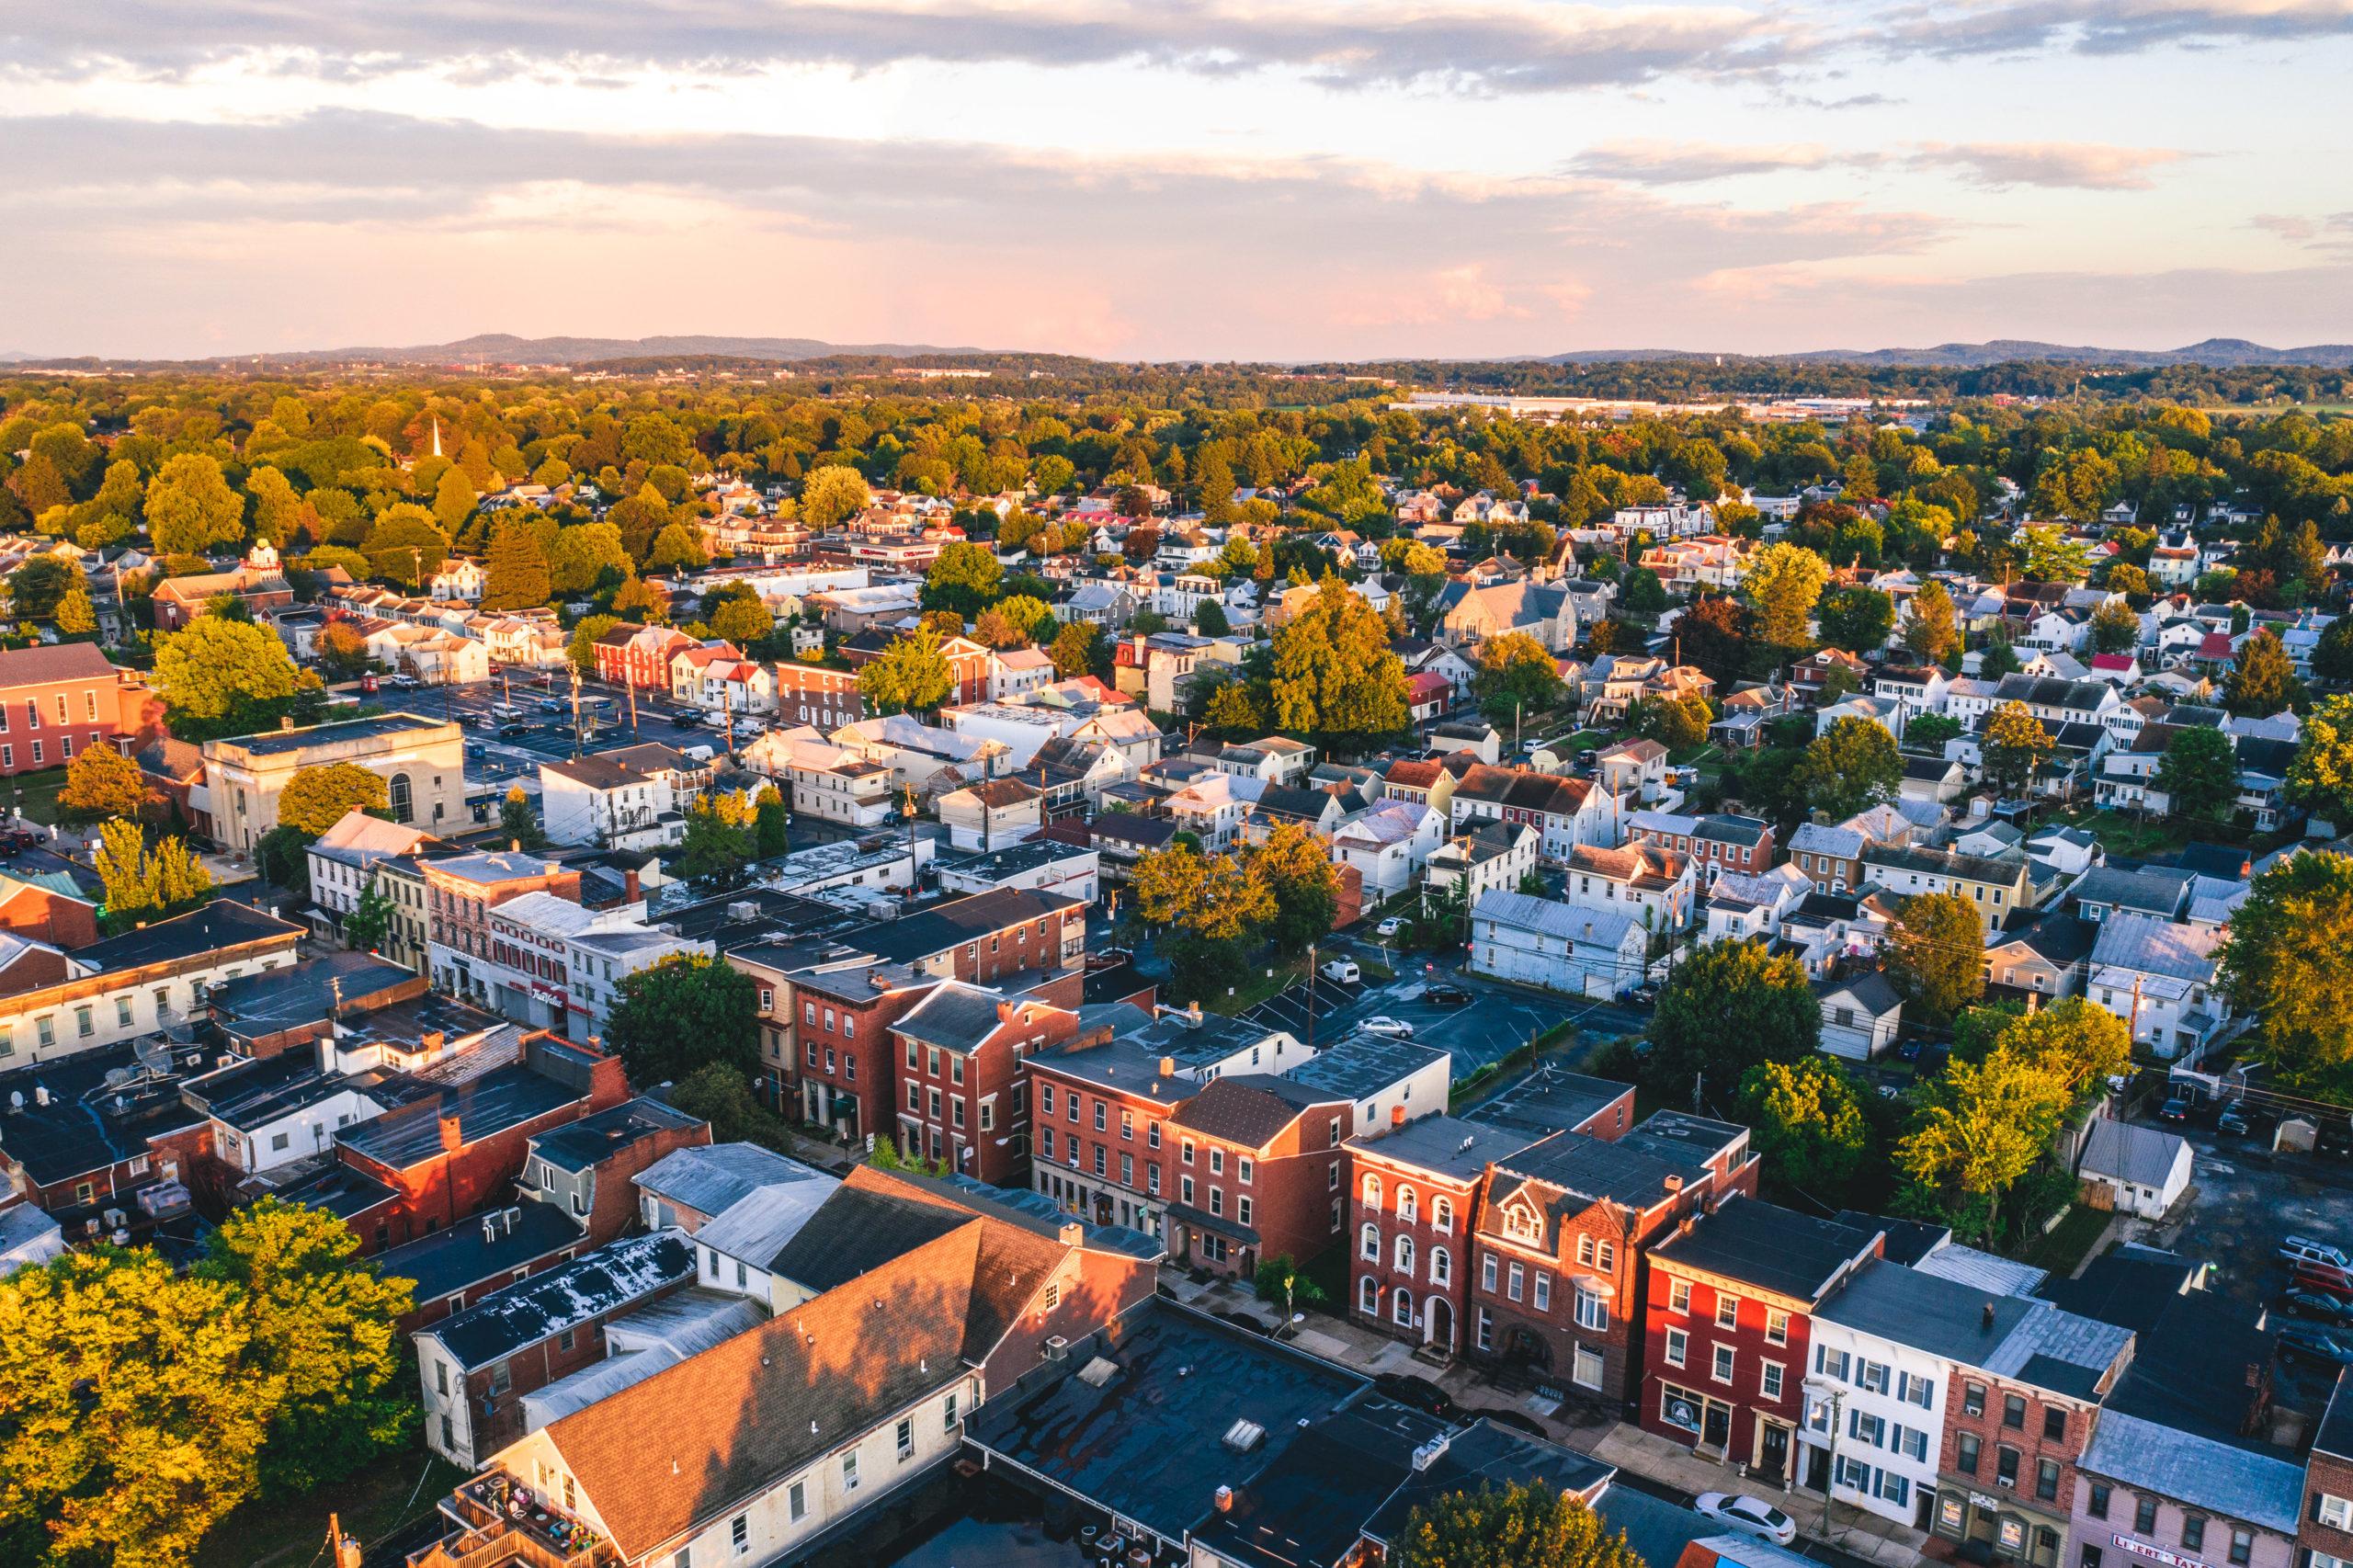 Mechanicsburg Aerial